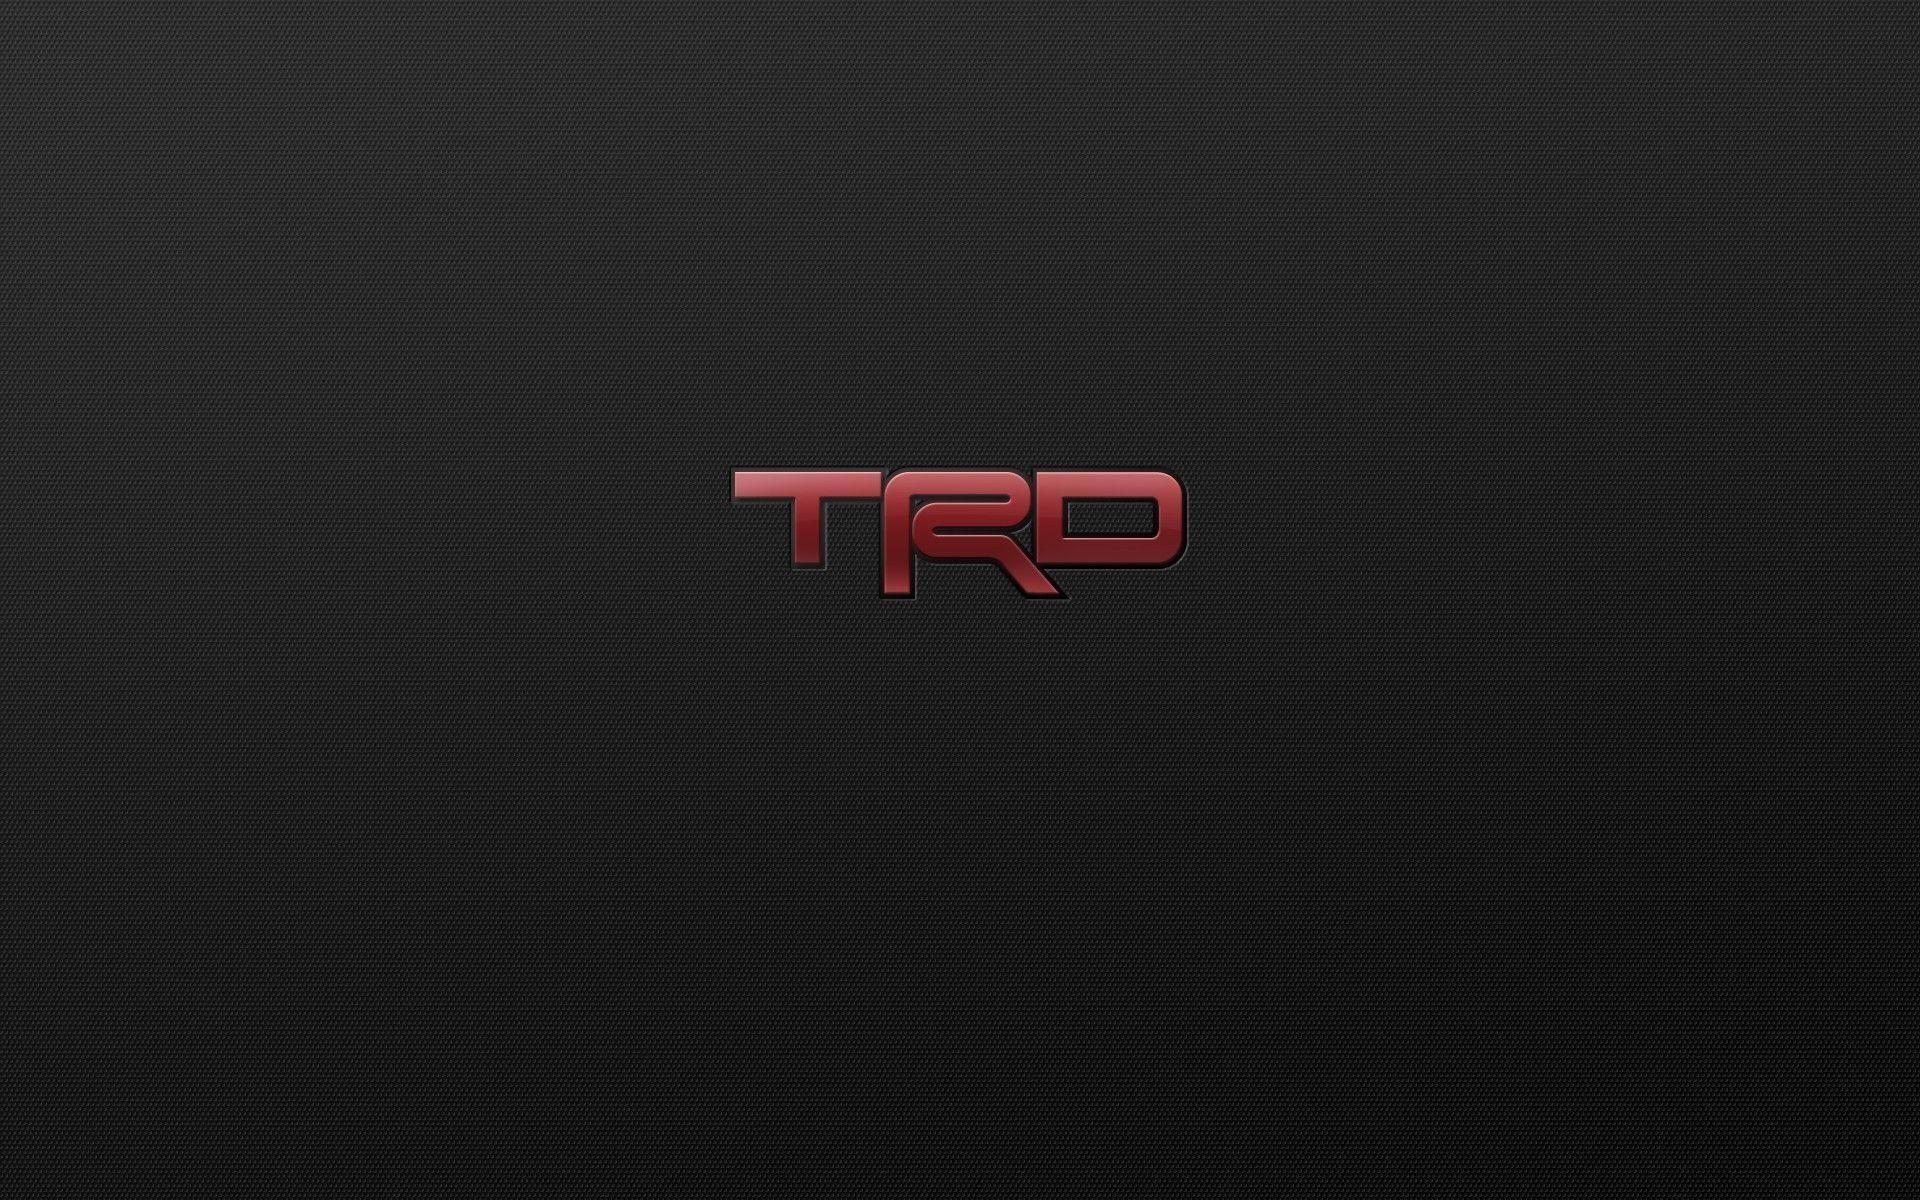 Trd Pro Tundra >> Trd Logo Wallpaper (59+ images)